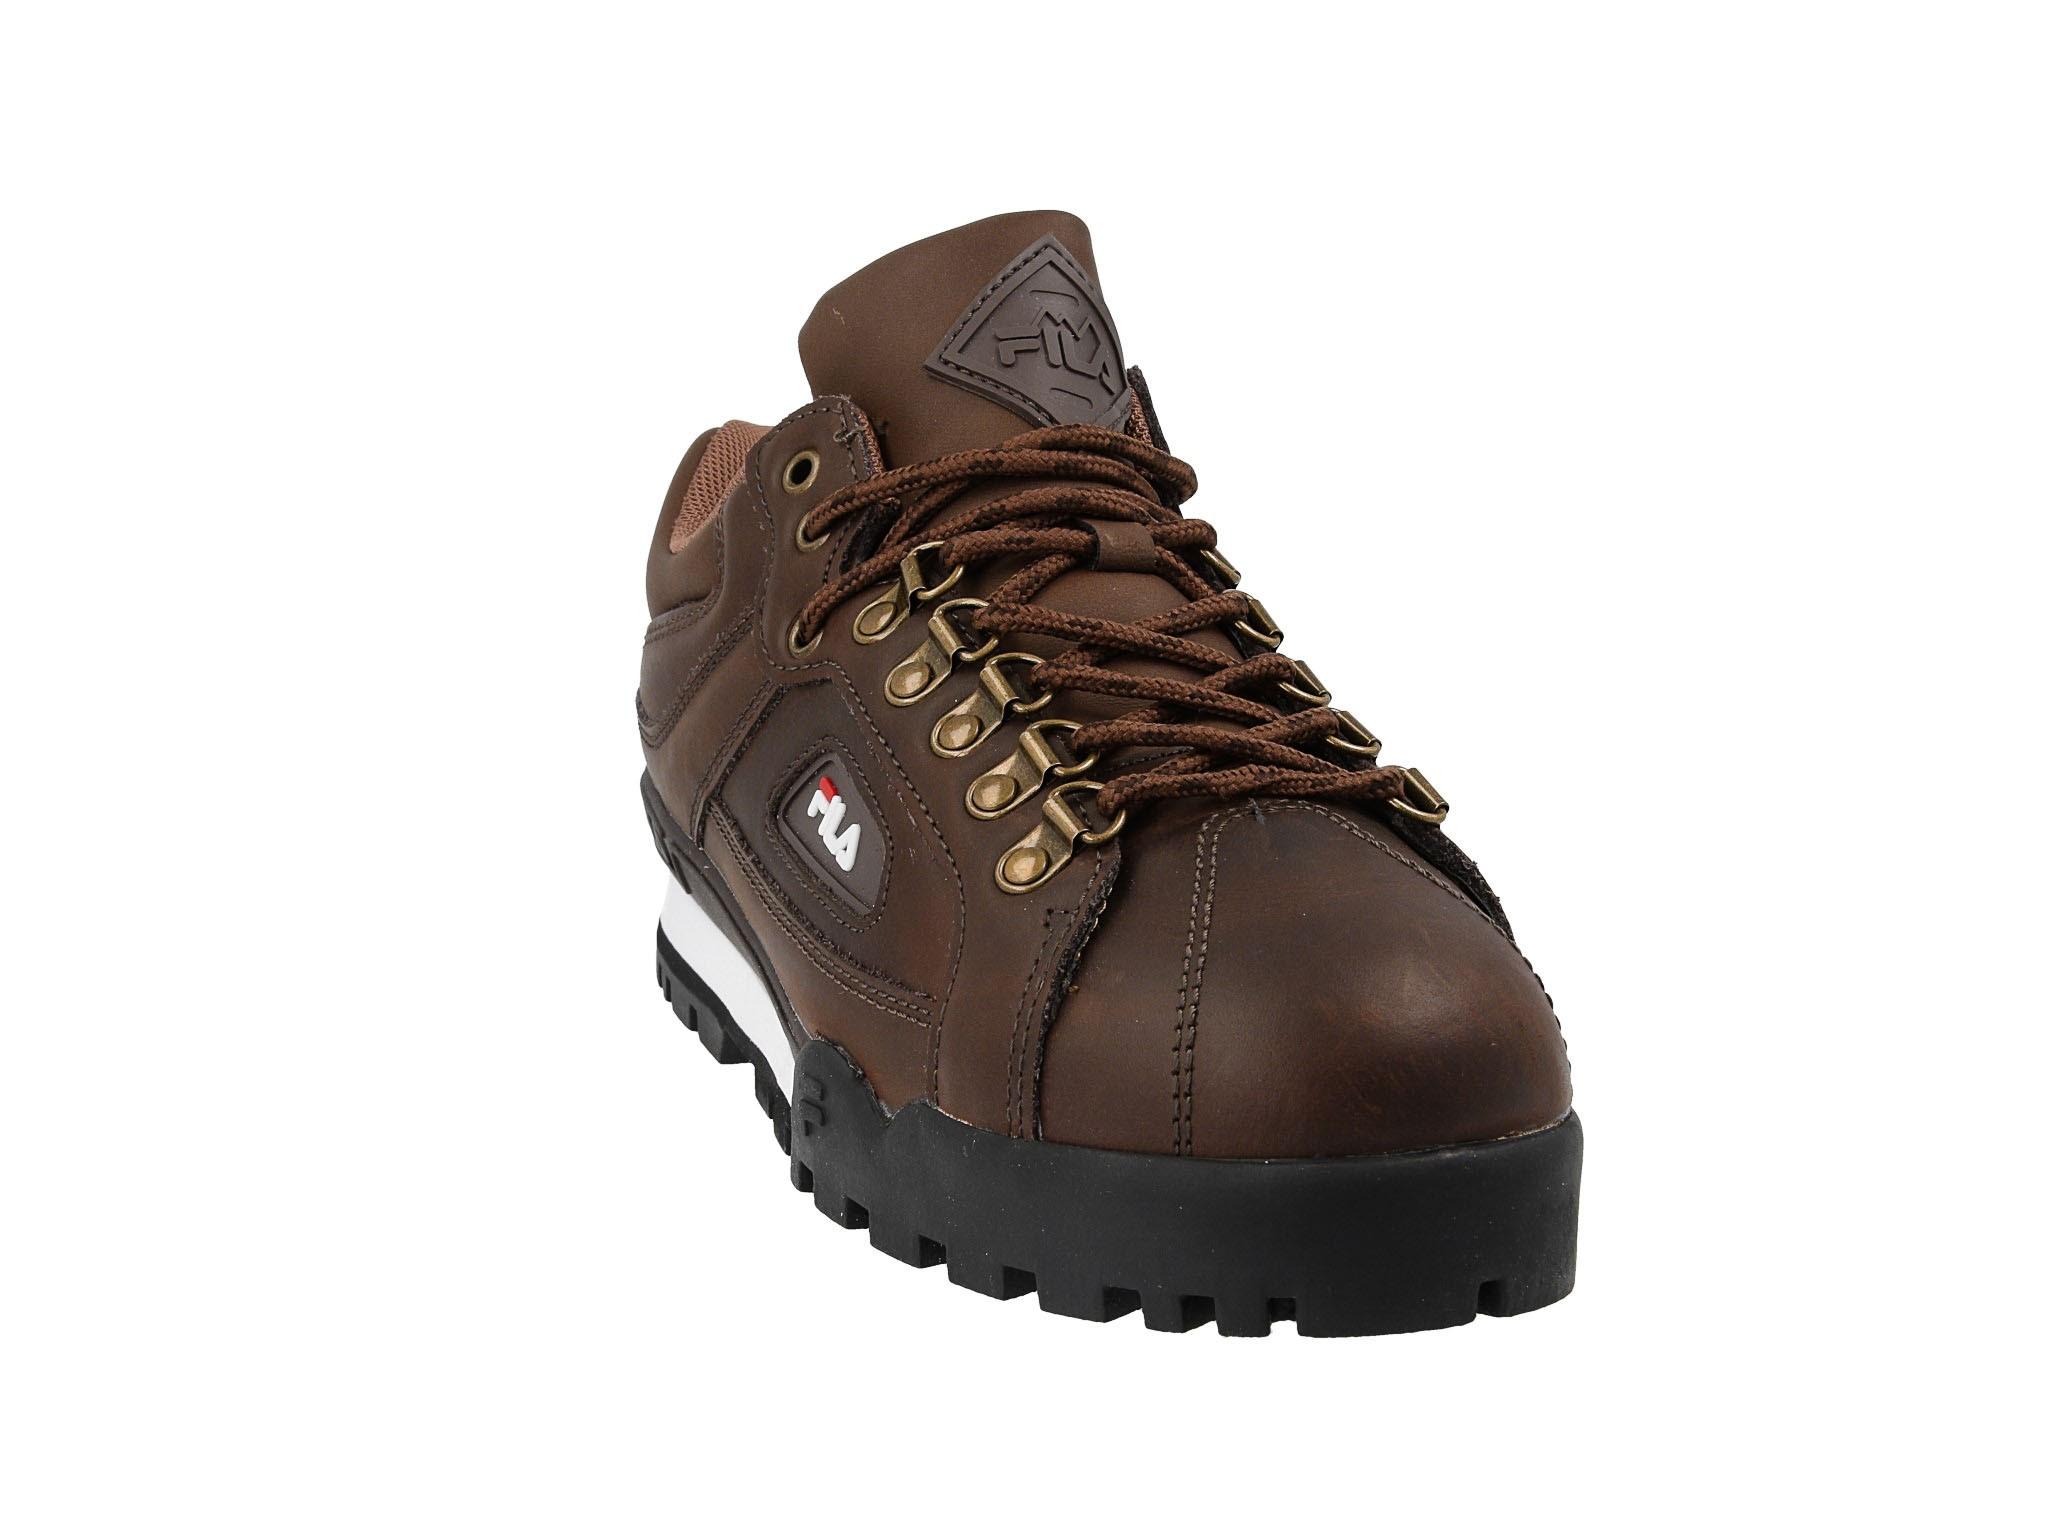 Fila Trailblazer Boots Brown